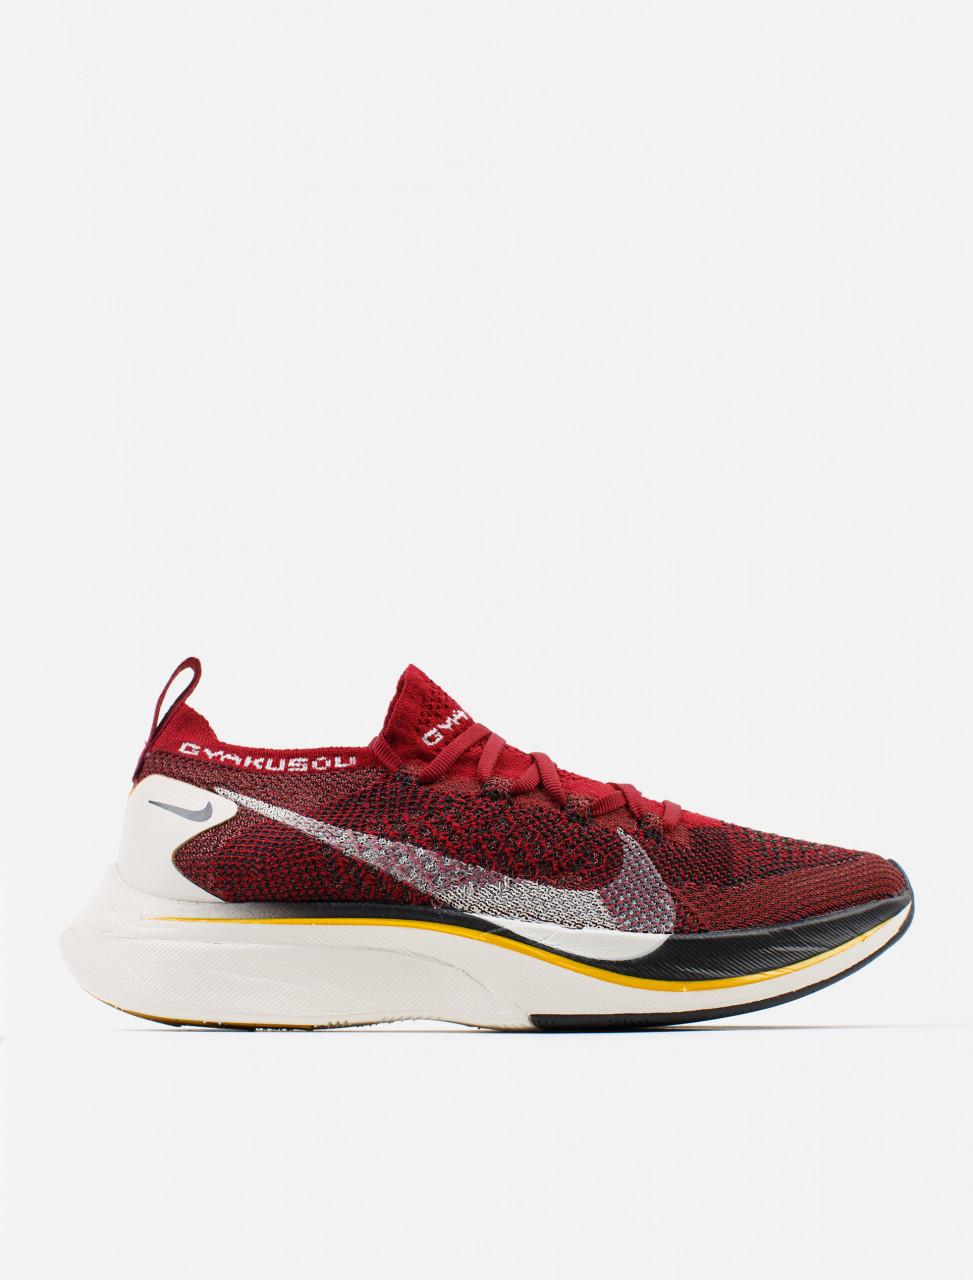 x Gyakusou Vaporfly 4% Flyknit Sneaker